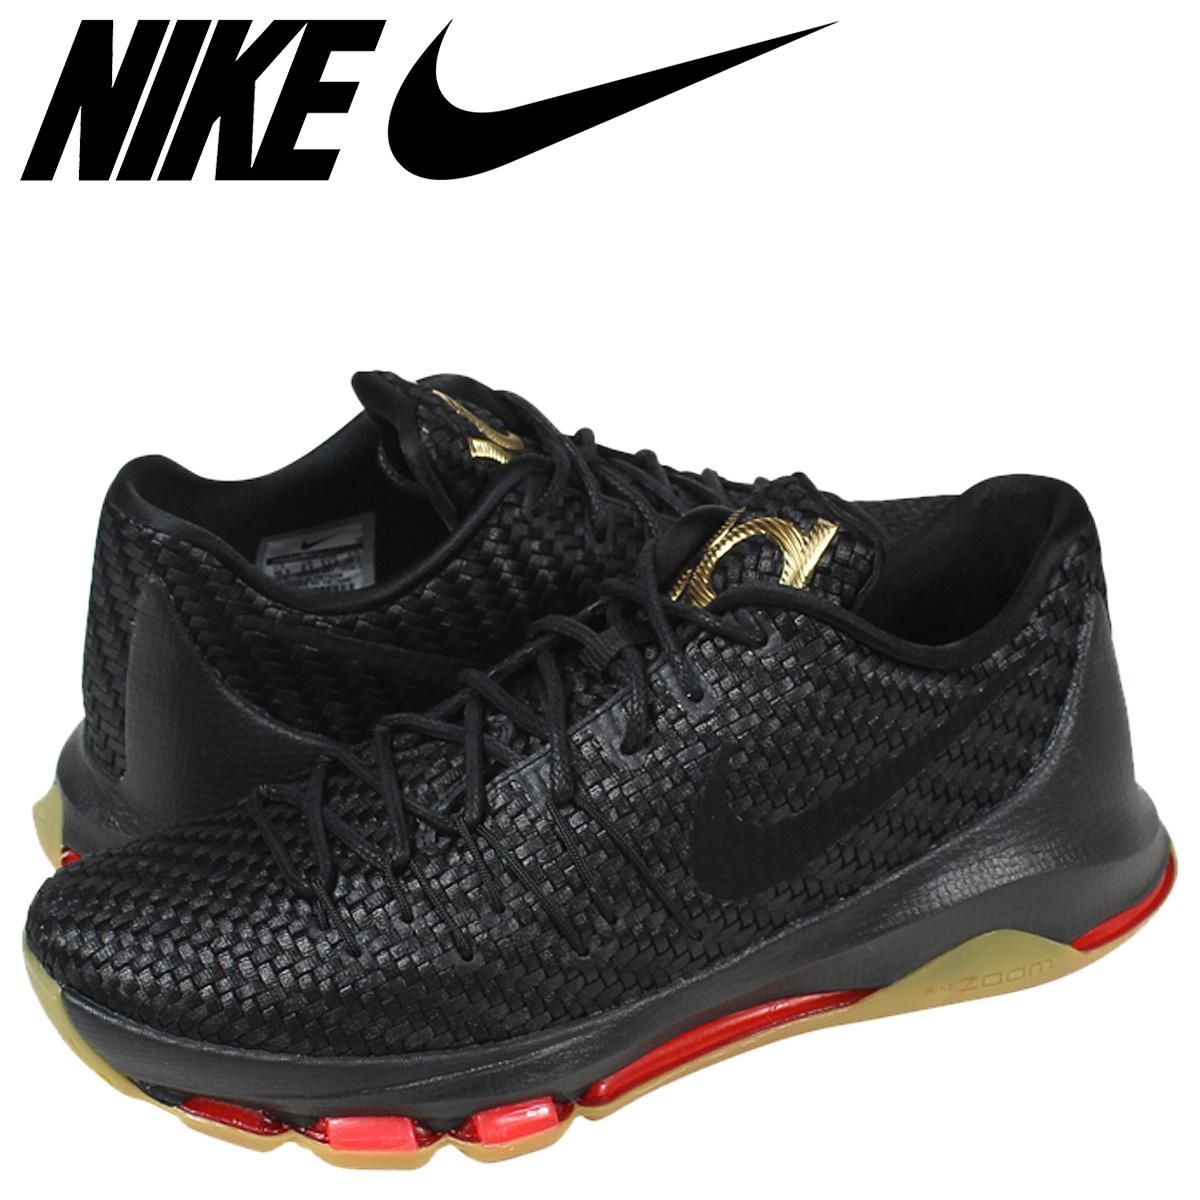 f2205c02c1ef ... hot nike nike sneakers kd 8 ext 806393 001 black mens 3ca0a fc094